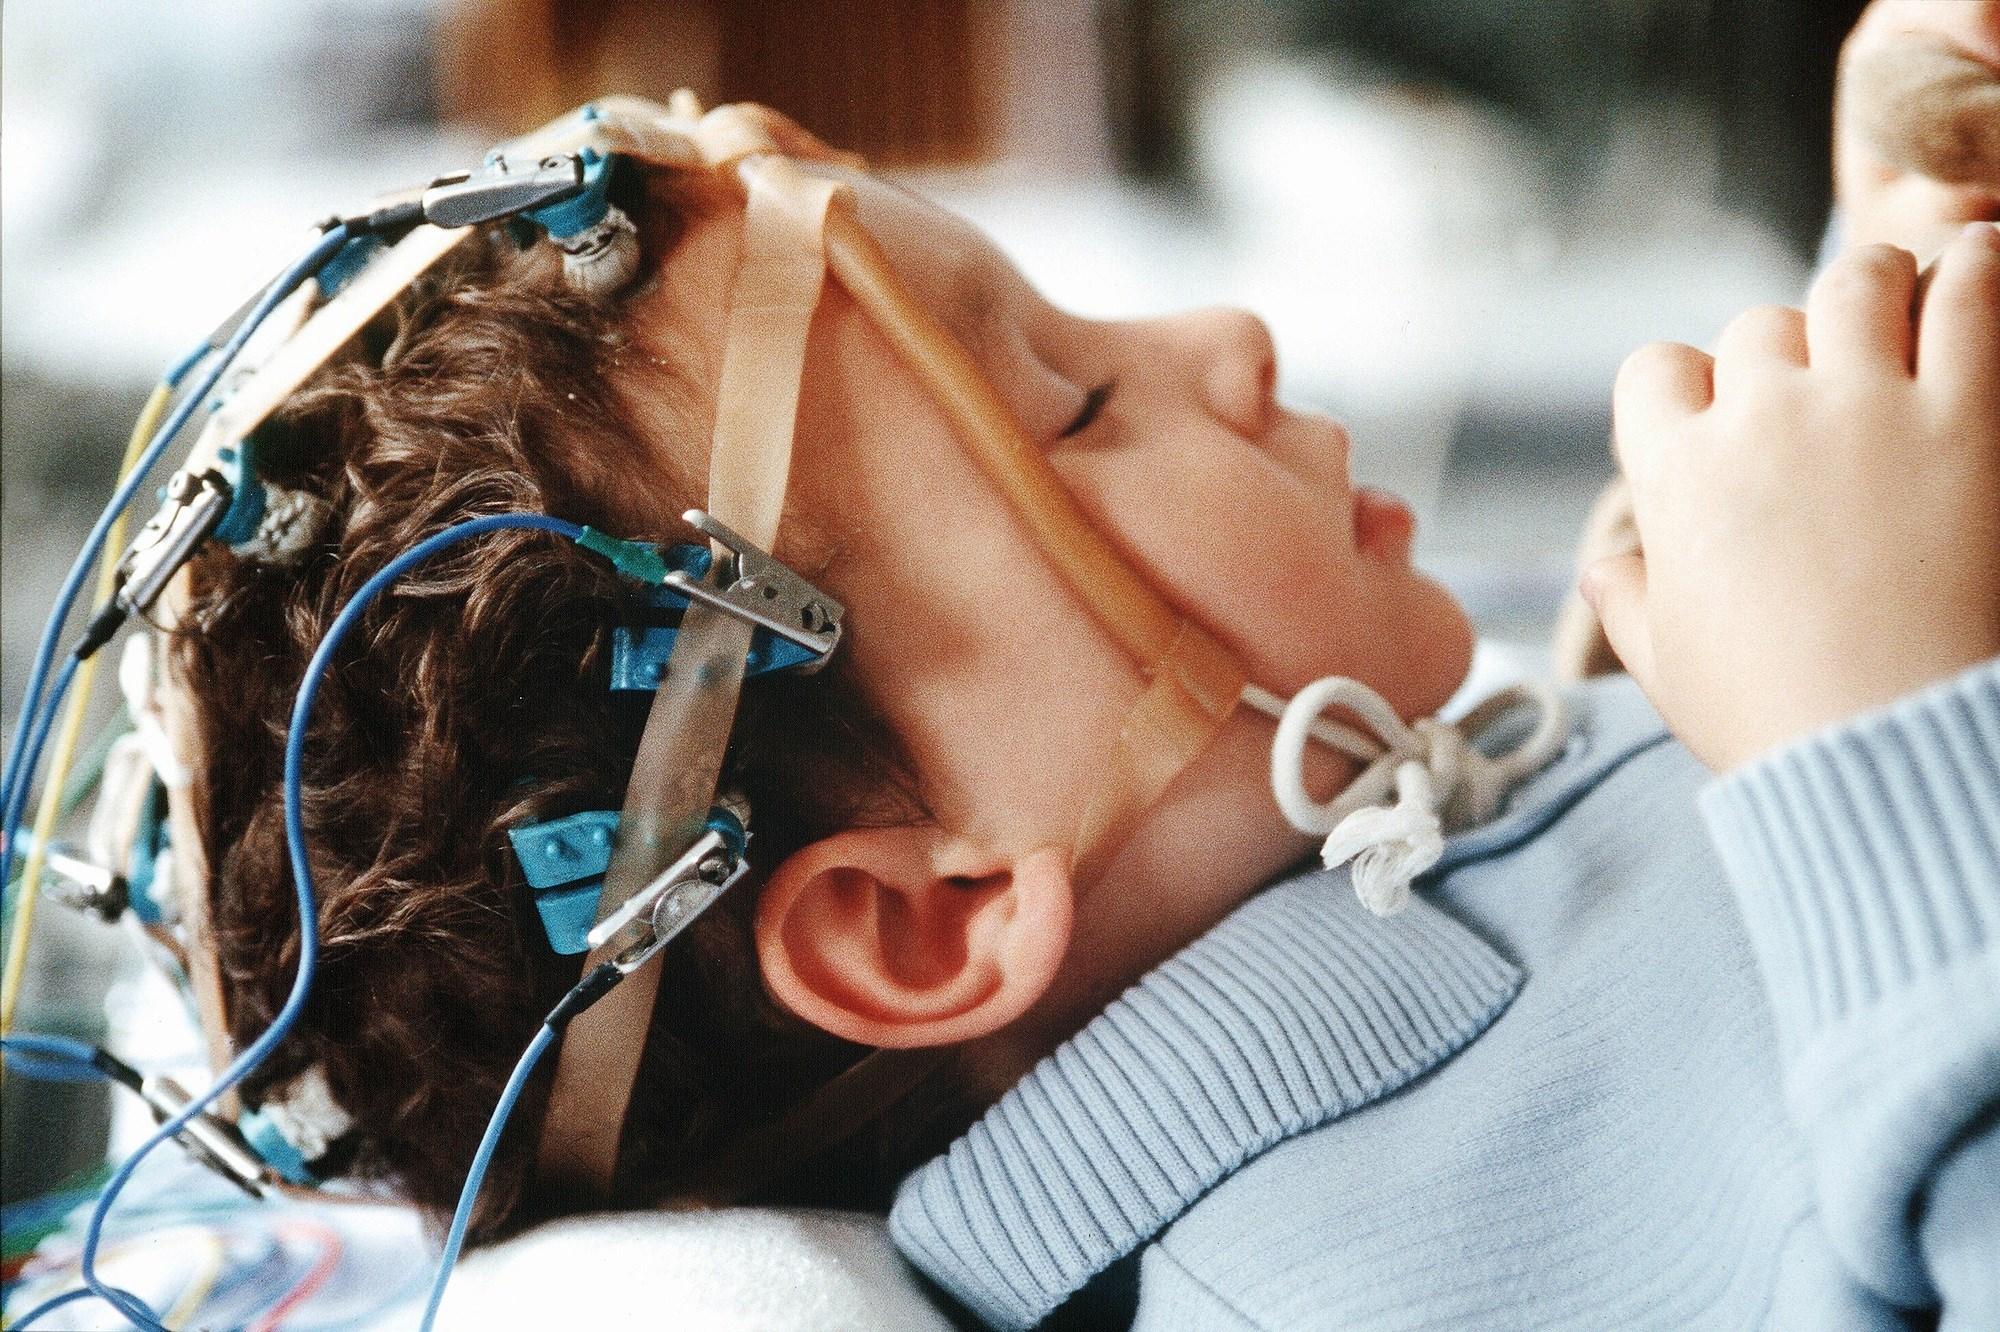 Fenfluramine Improves Emotion and Behavior Regulation in Pediatric Dravet Syndrome